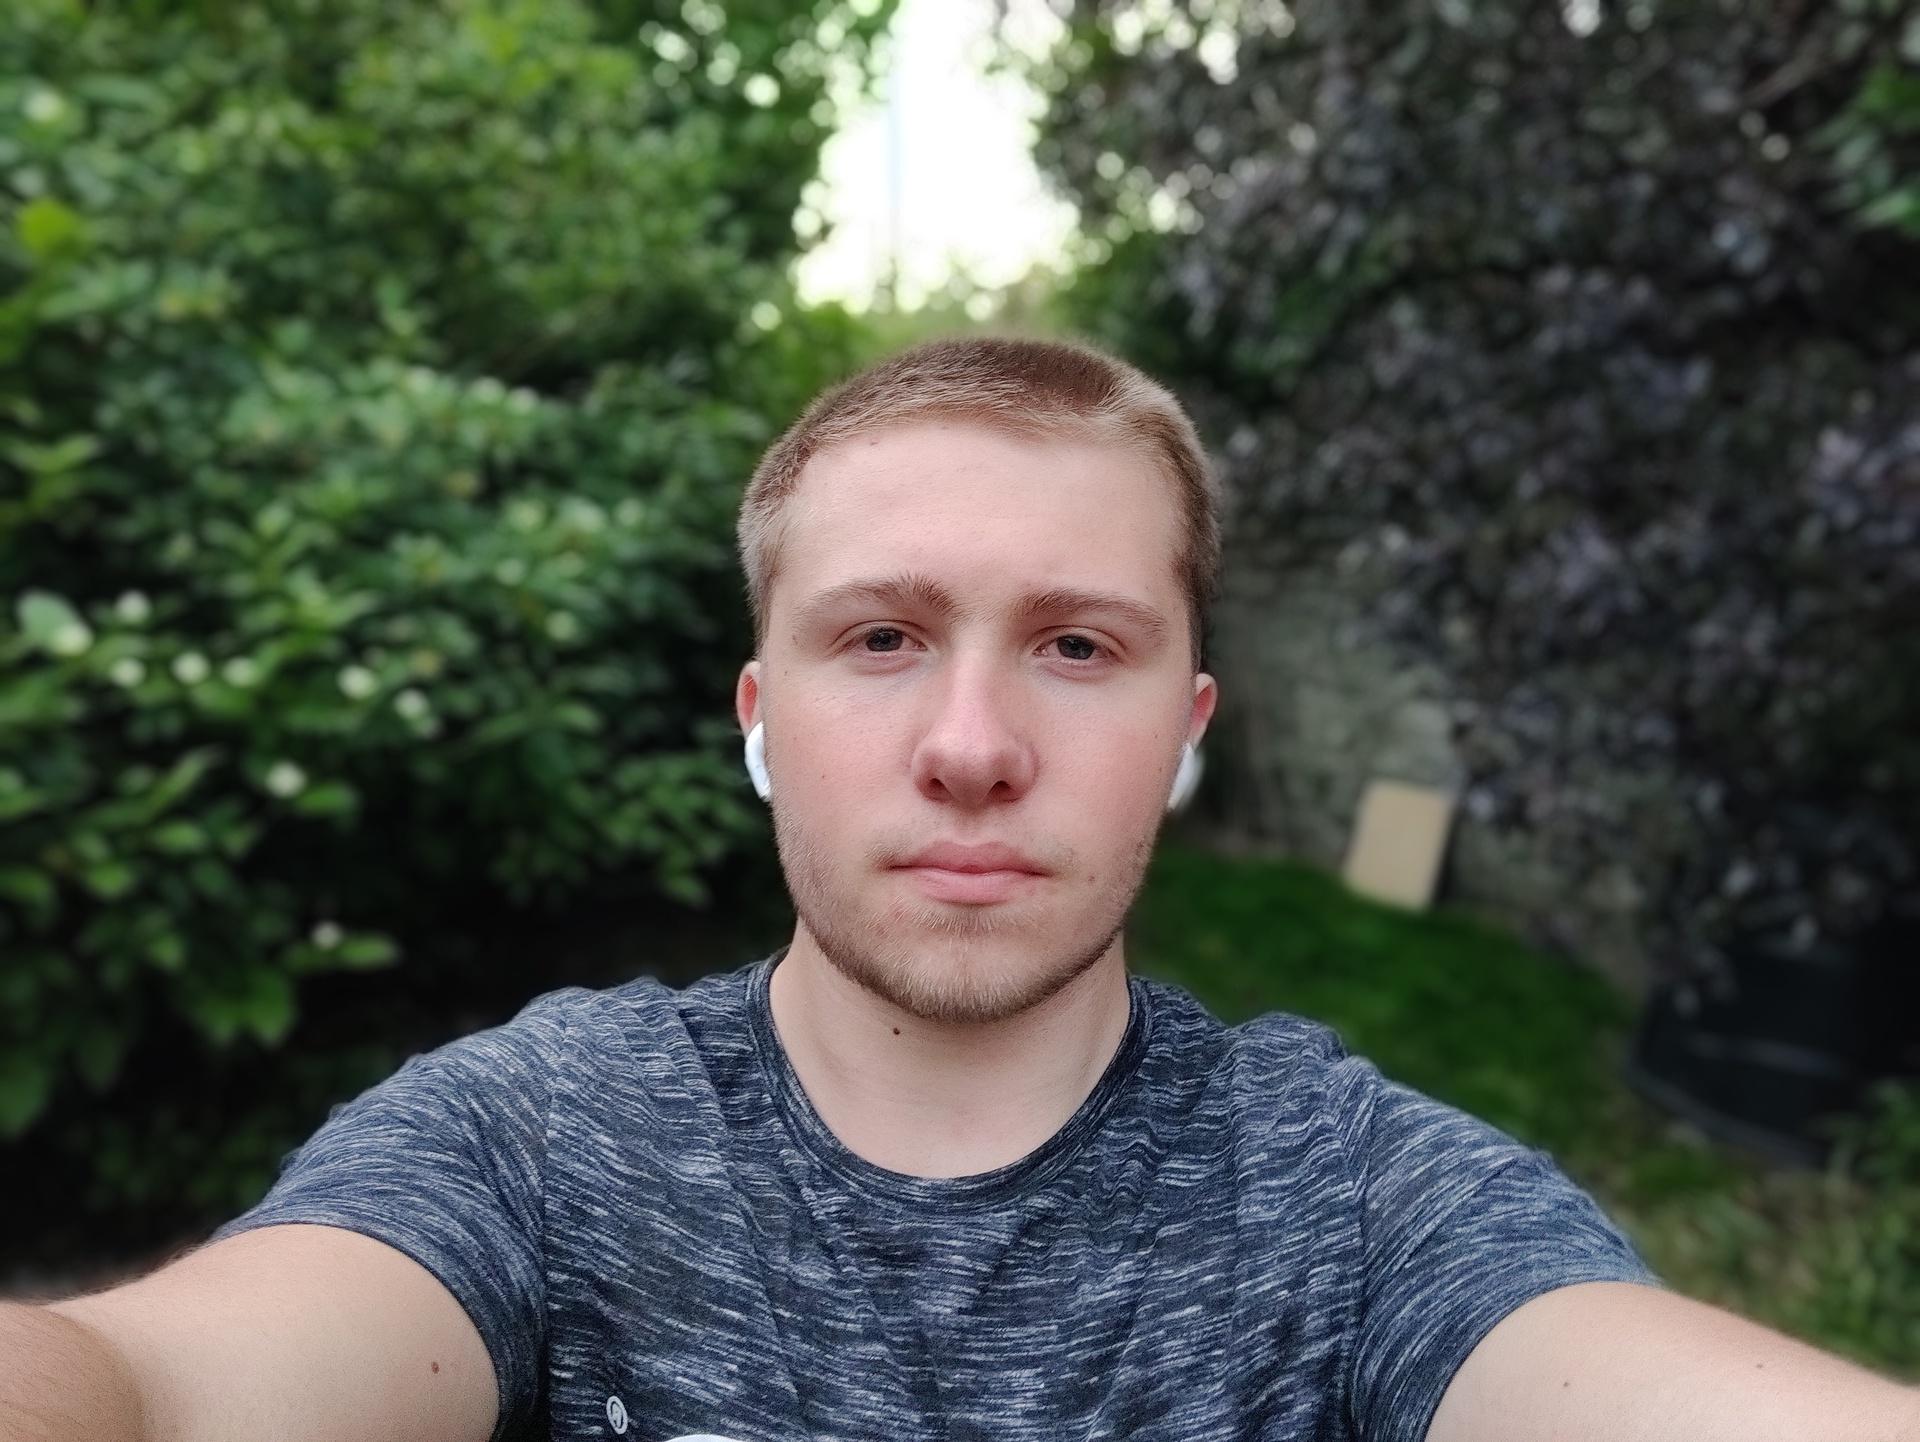 OnePlus Nord test image portrait mode selfie in garden